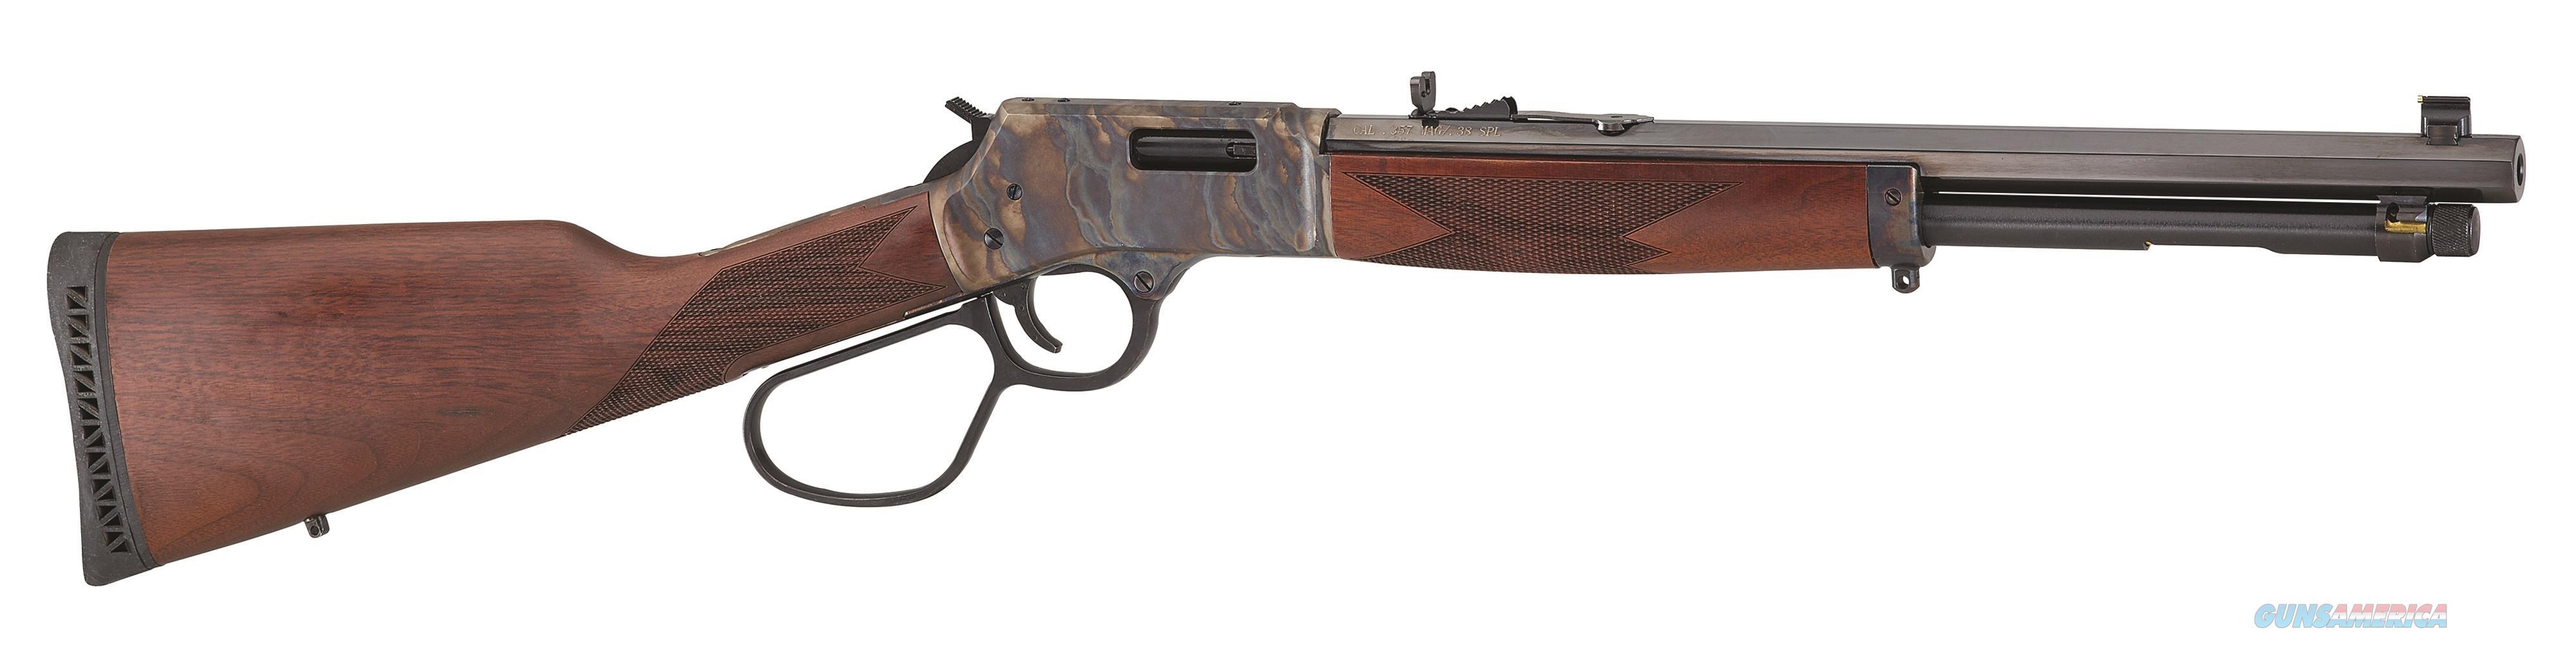 "Henry Big Boy Carbine CCH .357 Magnum/.38 Special 16.5"" H012MRCC  Guns > Rifles > Henry Rifle Company"